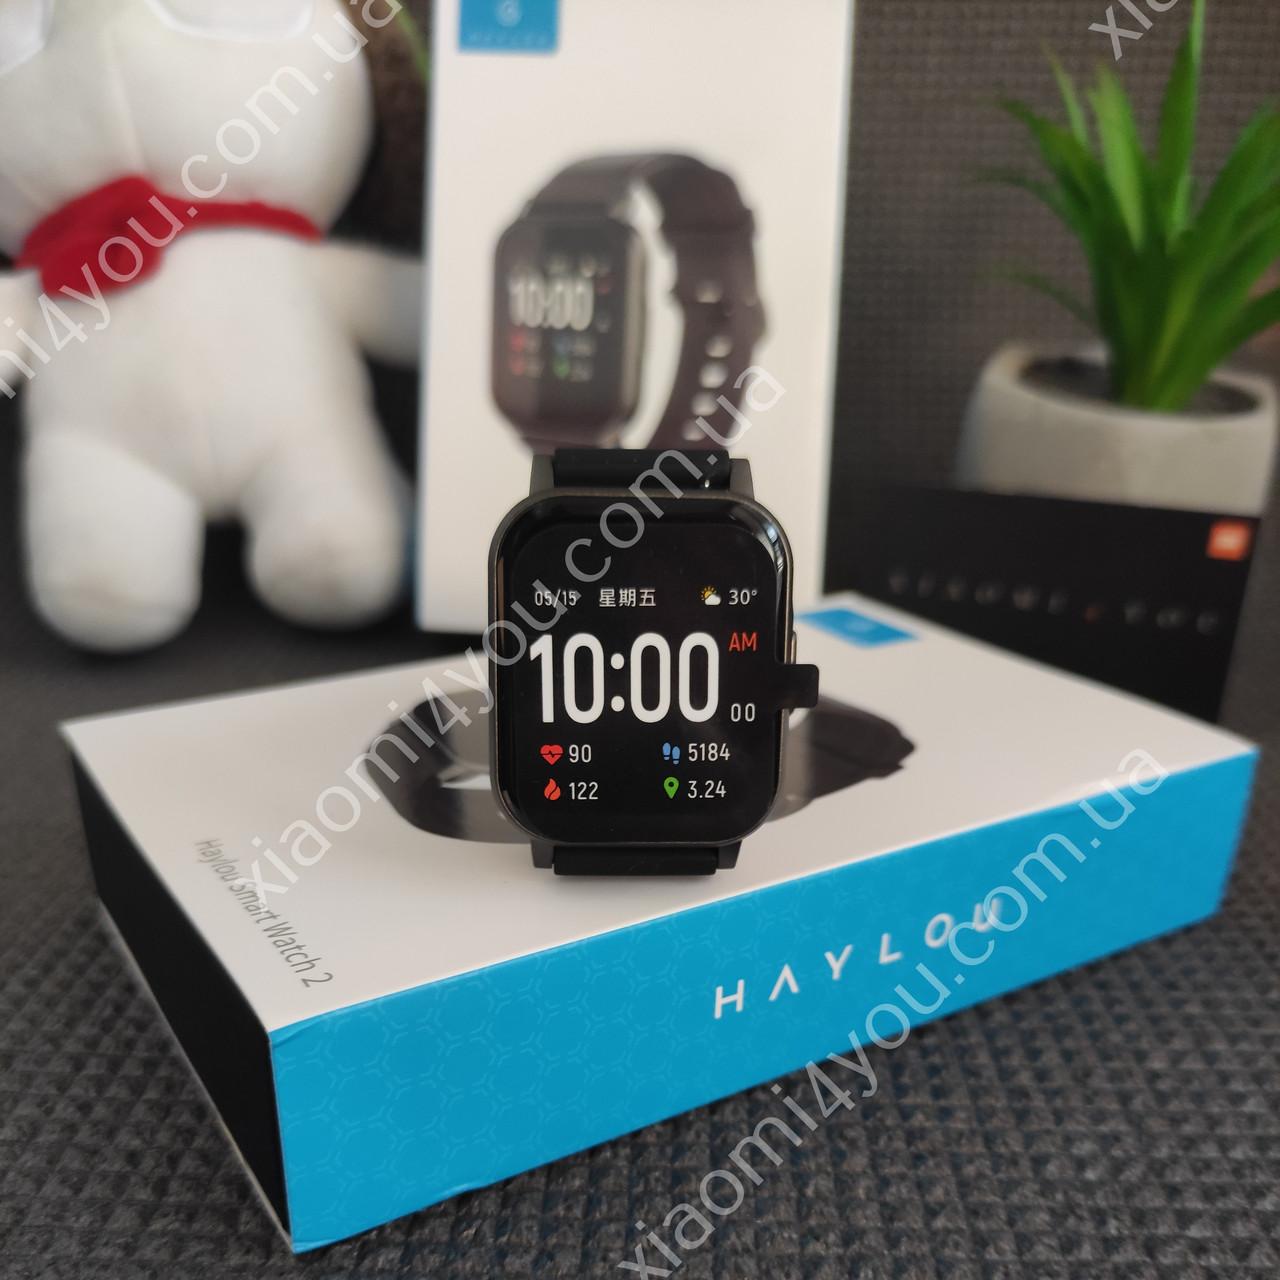 Cмарт-часы Xiaomi Haylou Smart Watch 2